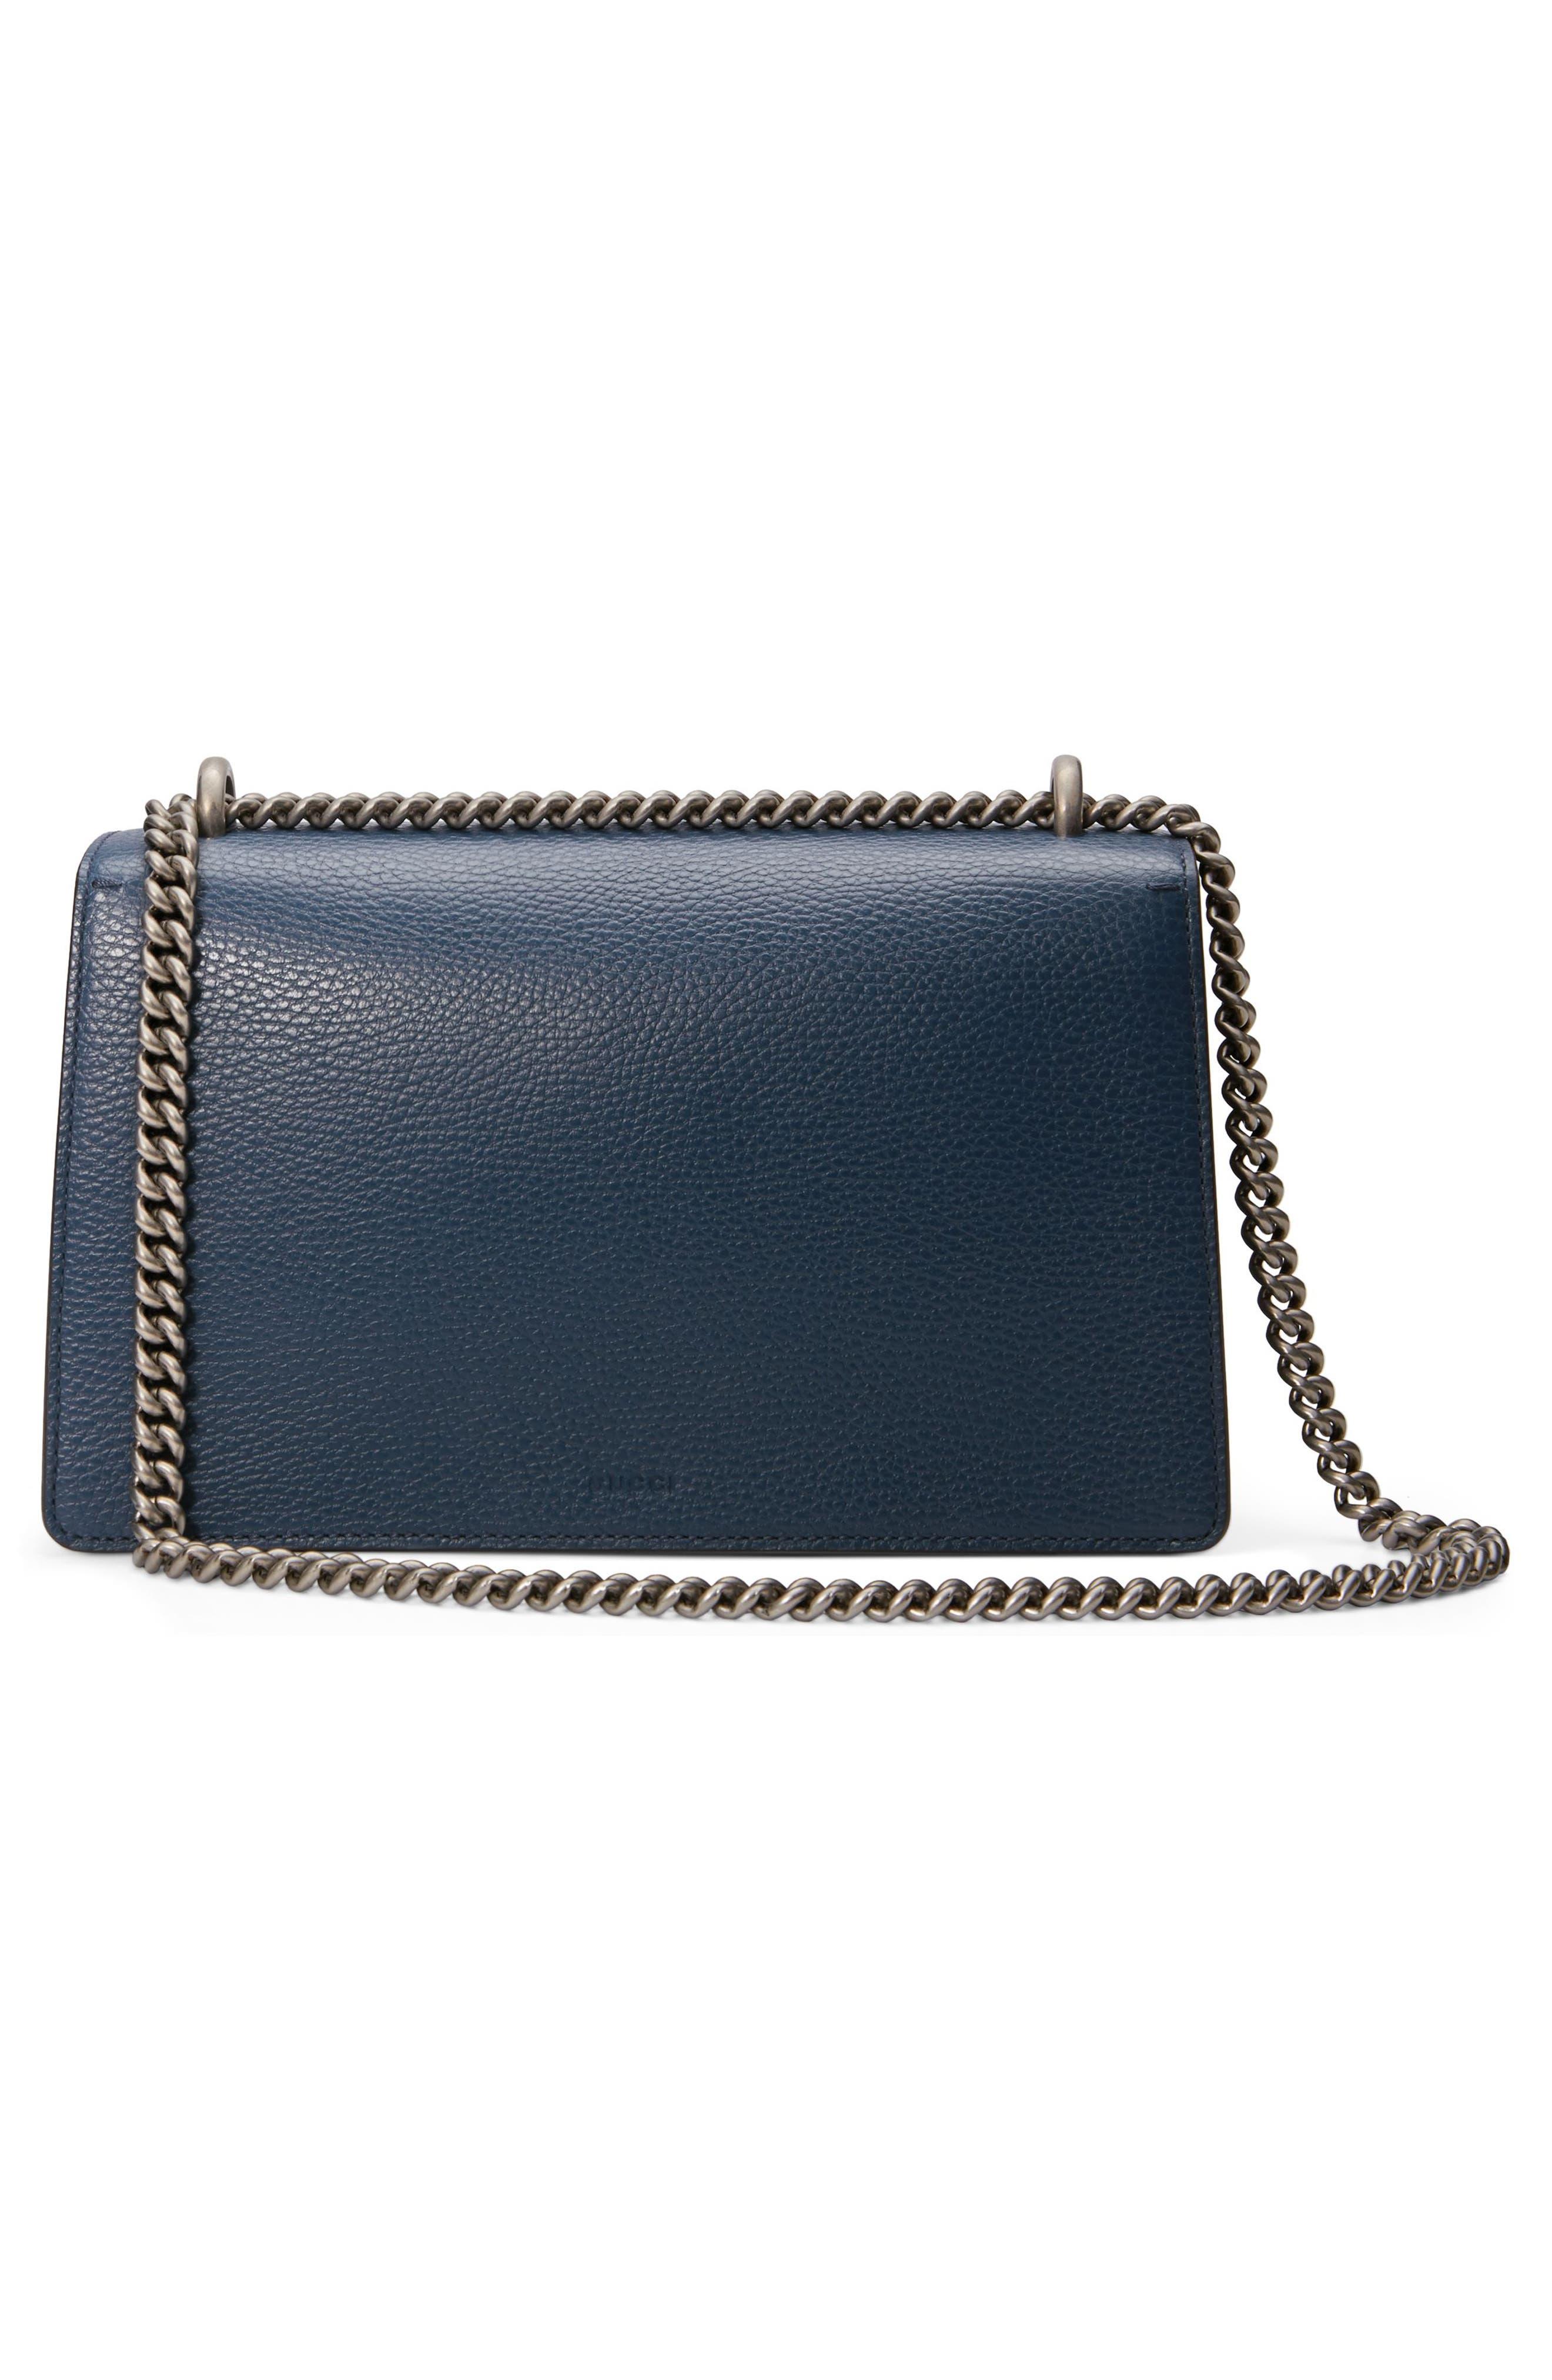 GUCCI, Small Dionysus Leather Shoulder Bag, Alternate thumbnail 2, color, BLU AGATA/ MONTANA